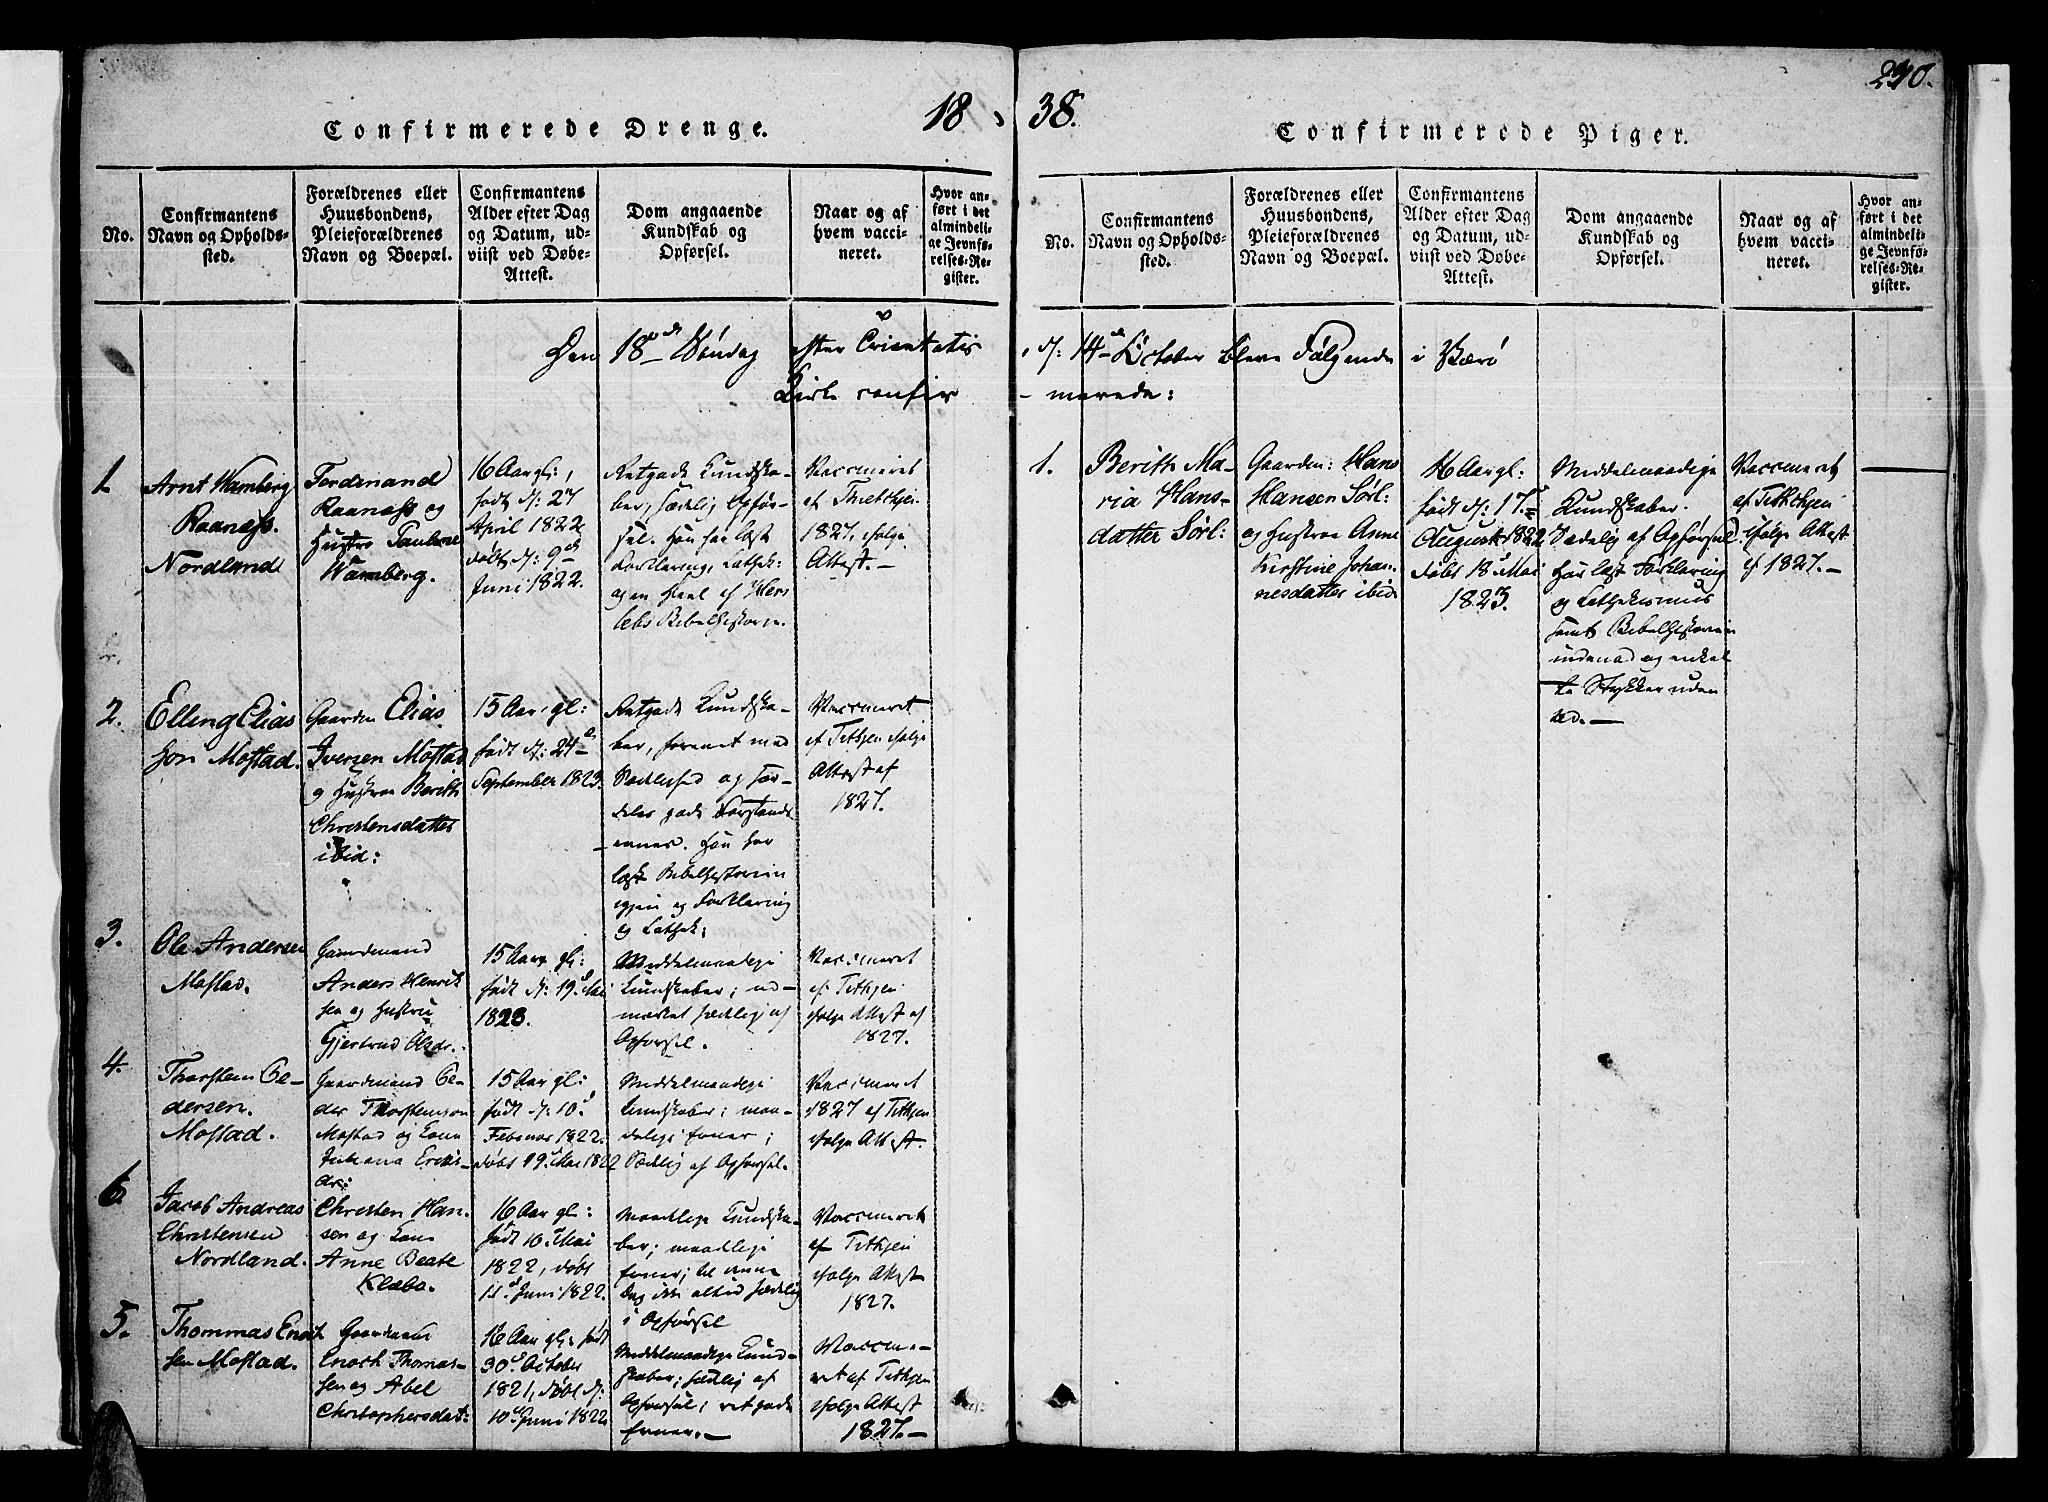 SAT, Ministerialprotokoller, klokkerbøker og fødselsregistre - Nordland, 807/L0120: Ministerialbok nr. 807A03, 1821-1848, s. 240